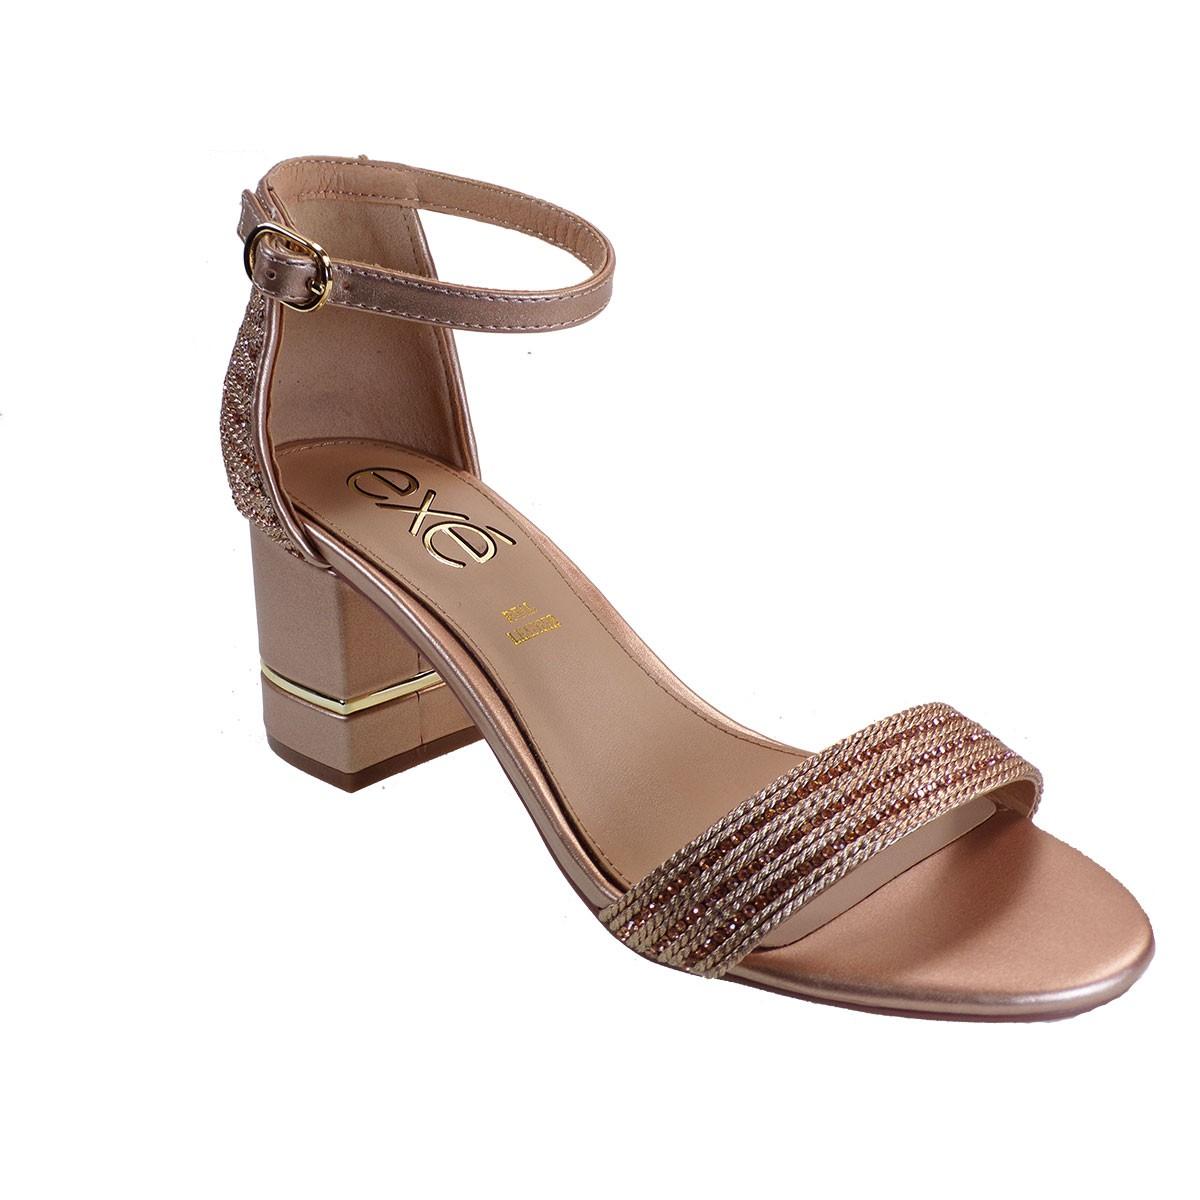 EXE Shoes Πέδιλα Γυναικεία 631-PENNY-361 Ροζ Χρυσό Στράς Μακραμε M47006314P50